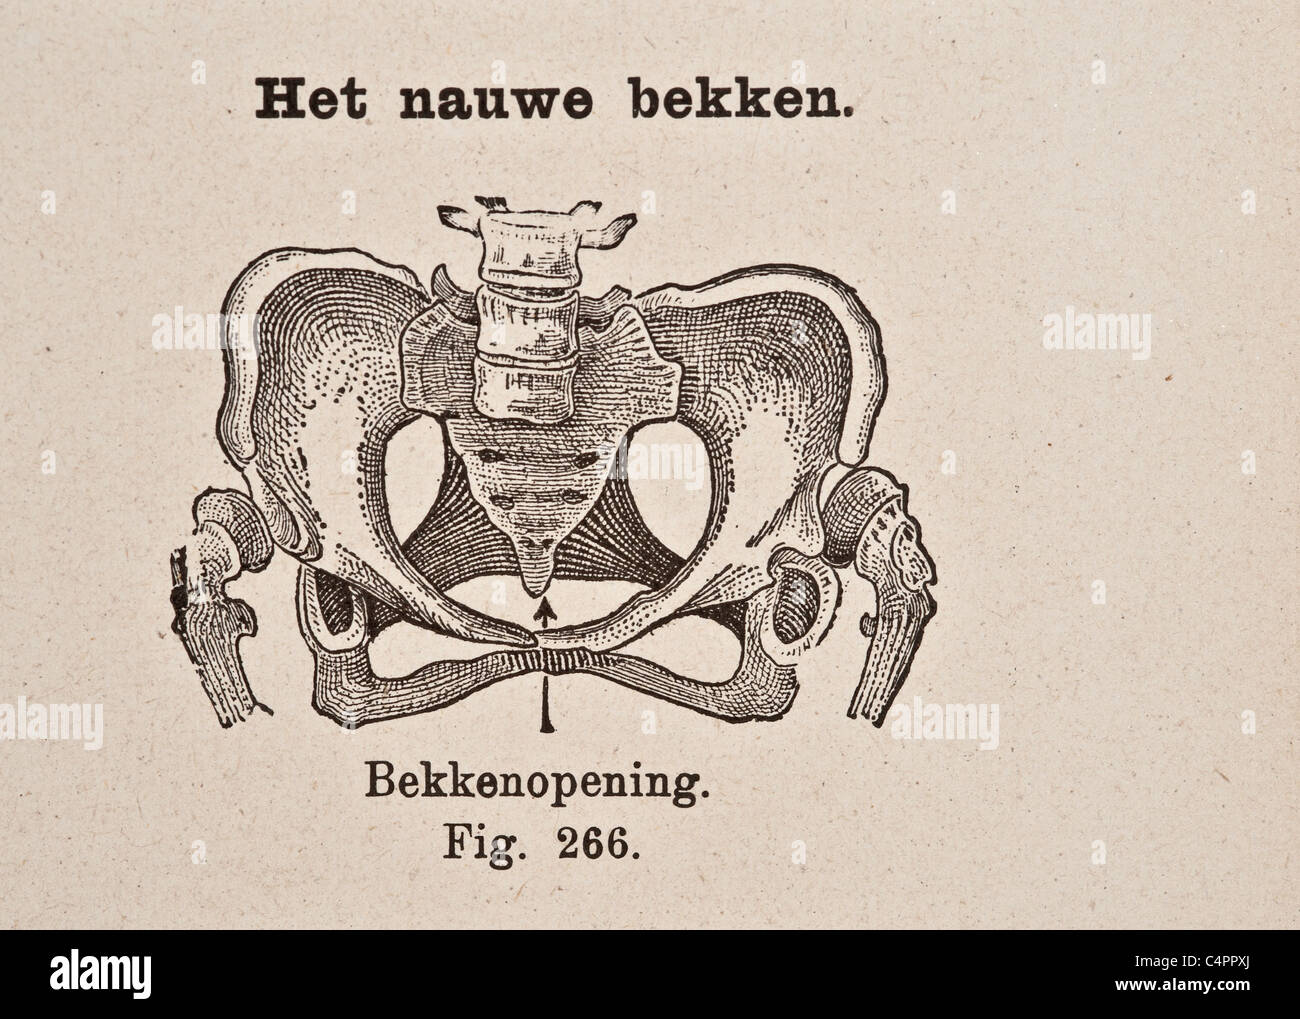 Pelvic Bone Joint Stockfotos & Pelvic Bone Joint Bilder - Alamy